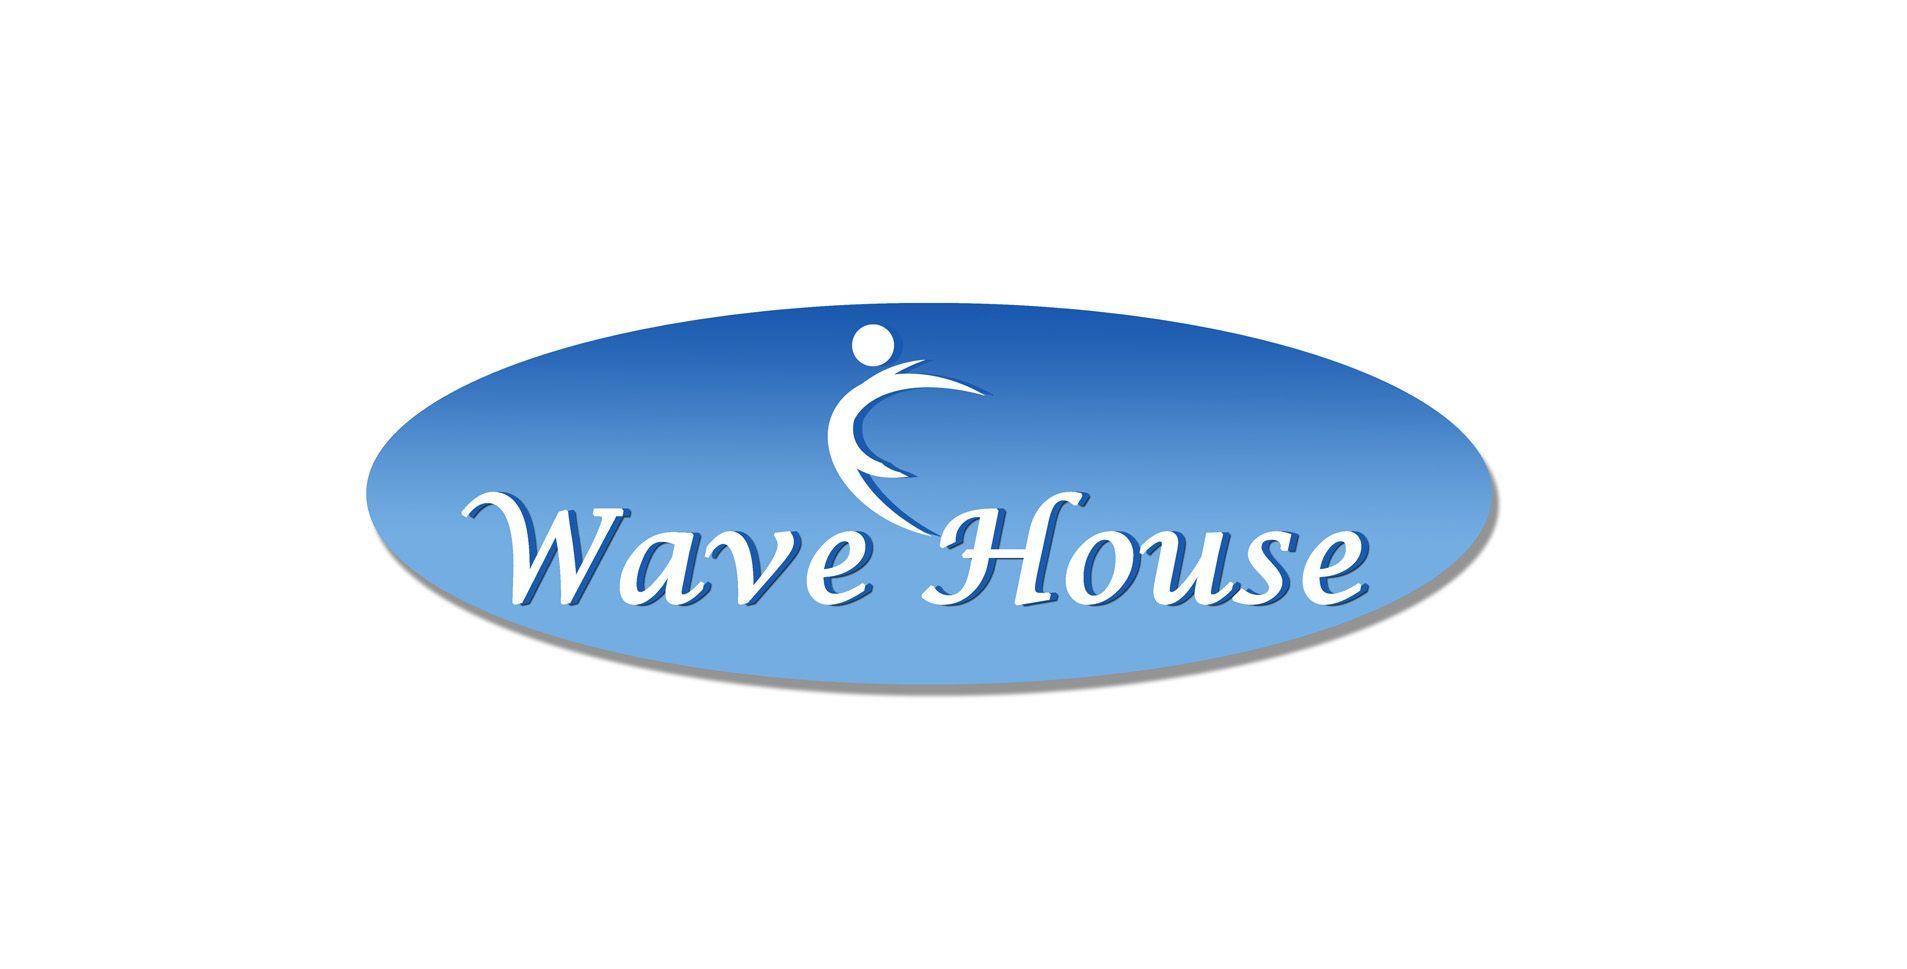 Редизайн логотипа для серф-кэмпа на Бали - дизайнер imanka